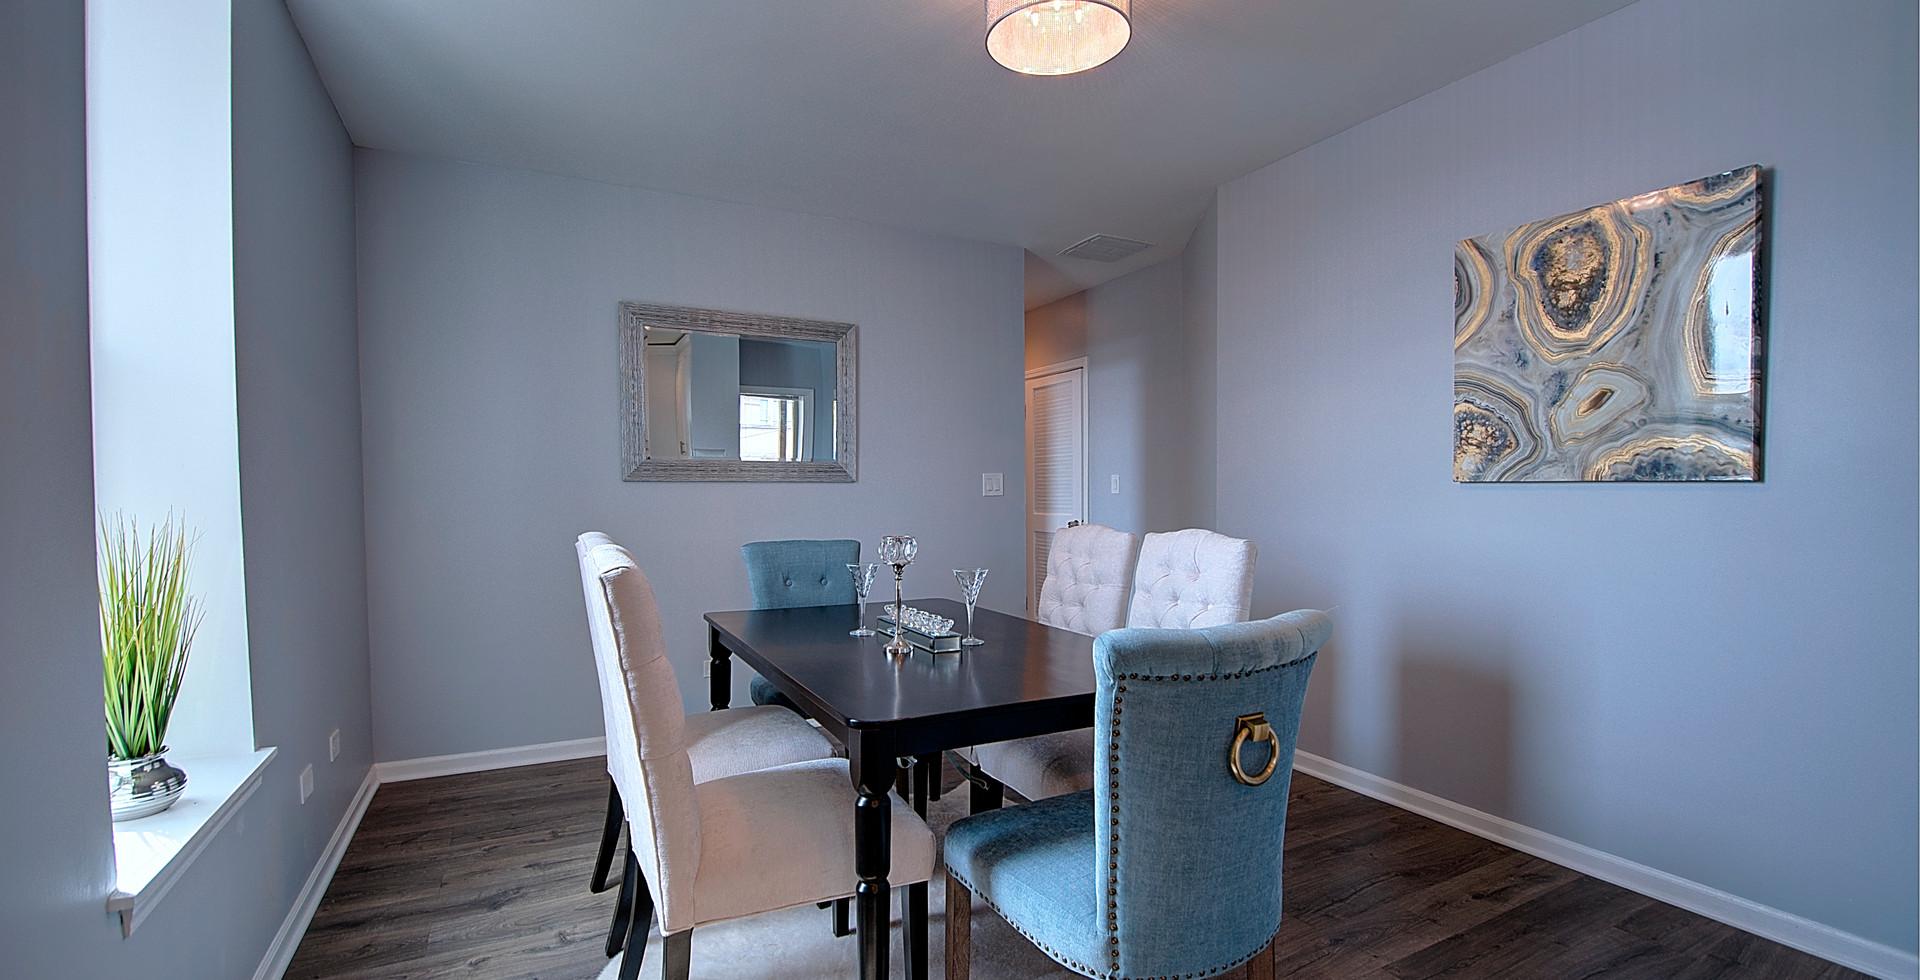 Dining Room in Park Forest designed by MRM Home Design.jpg